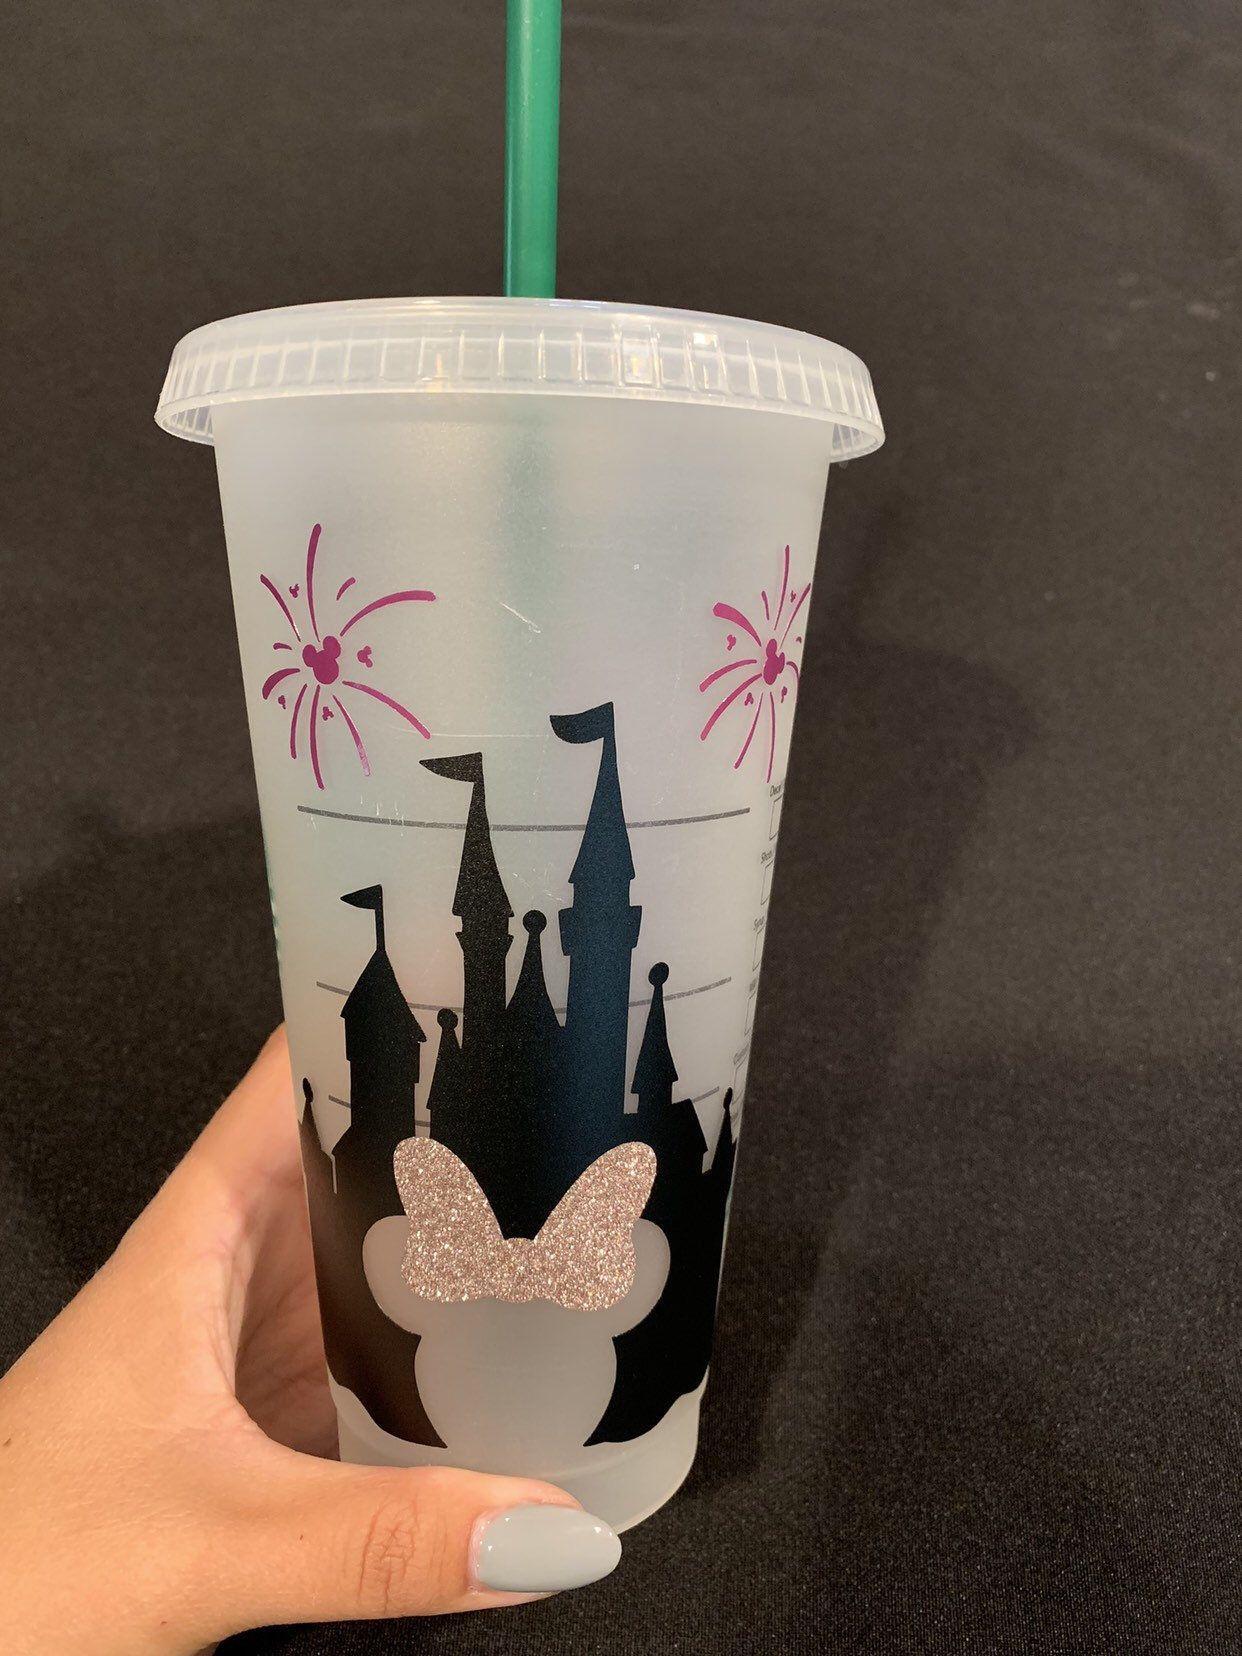 Chateau De Disney Gobelet Starbucks Starbucks Personnalisee De La